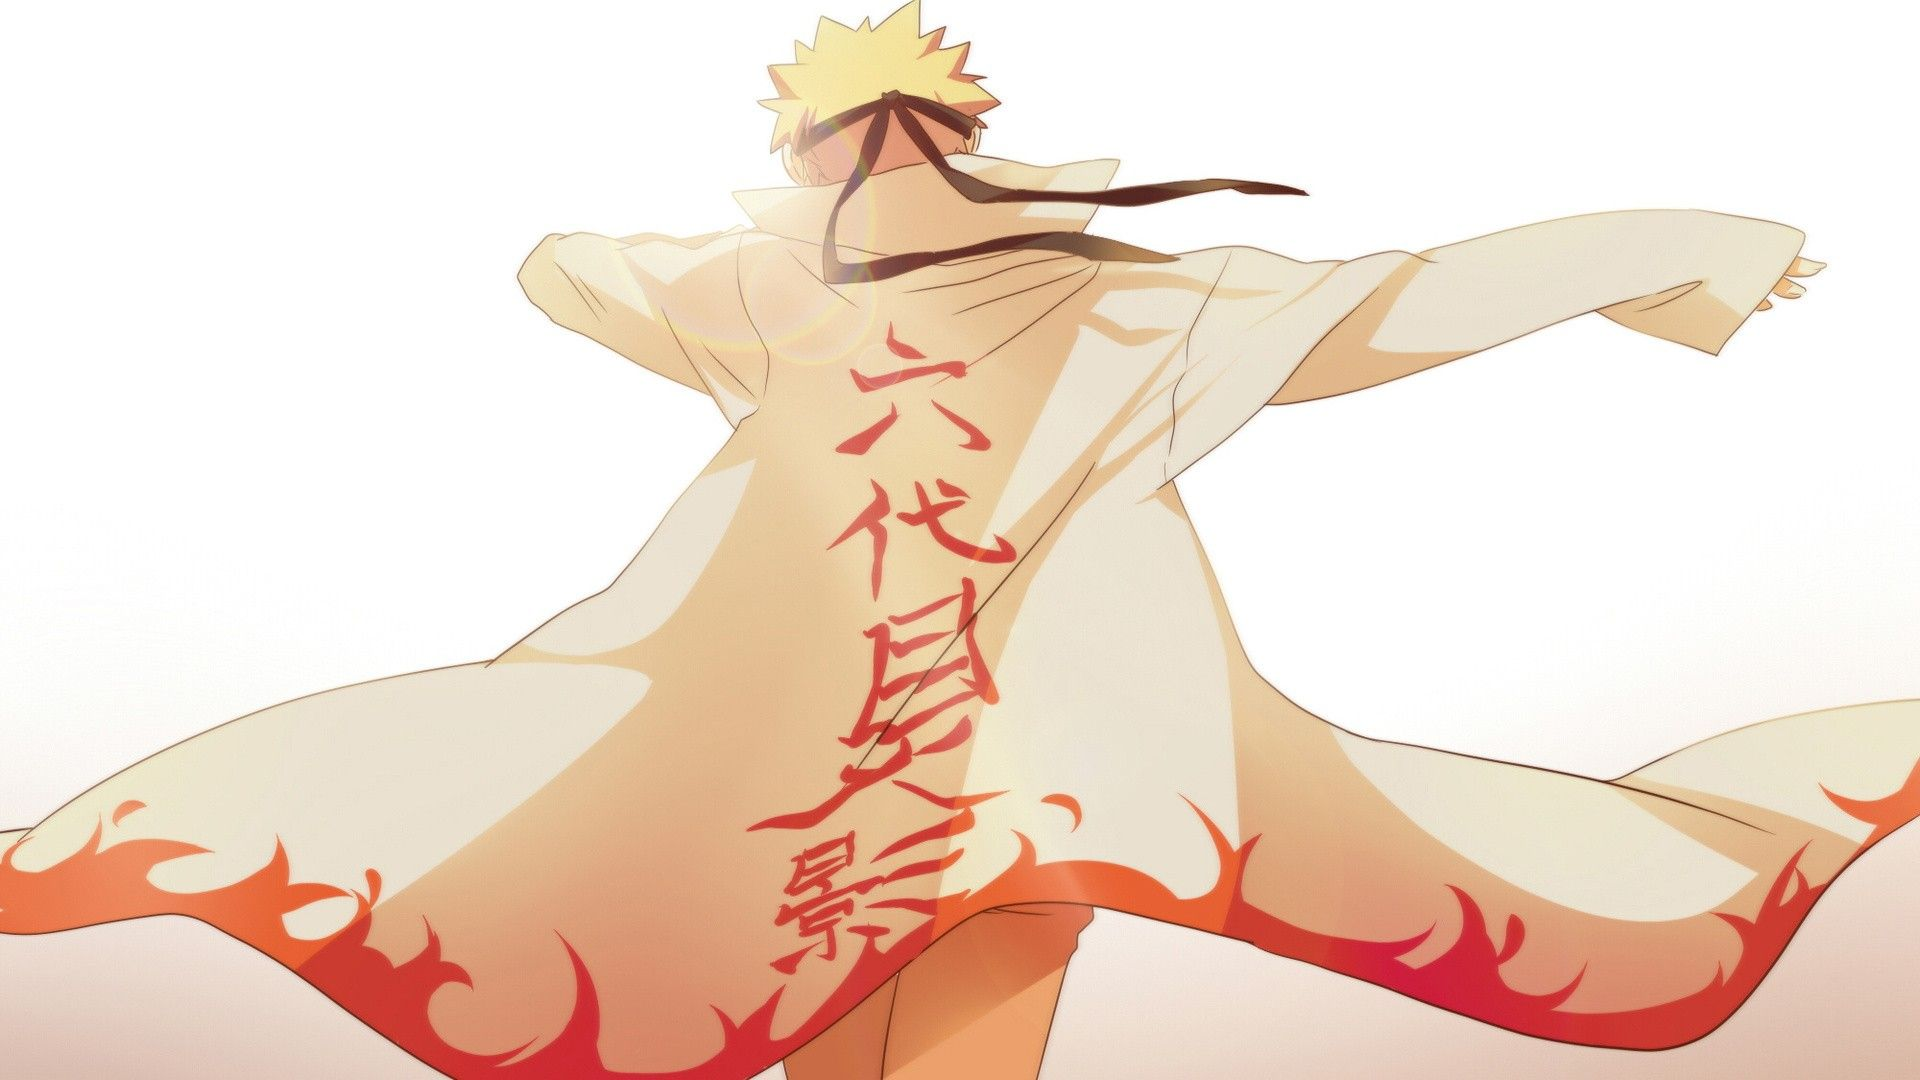 Naruto HD Wallpaper   Background Image   1920x1080